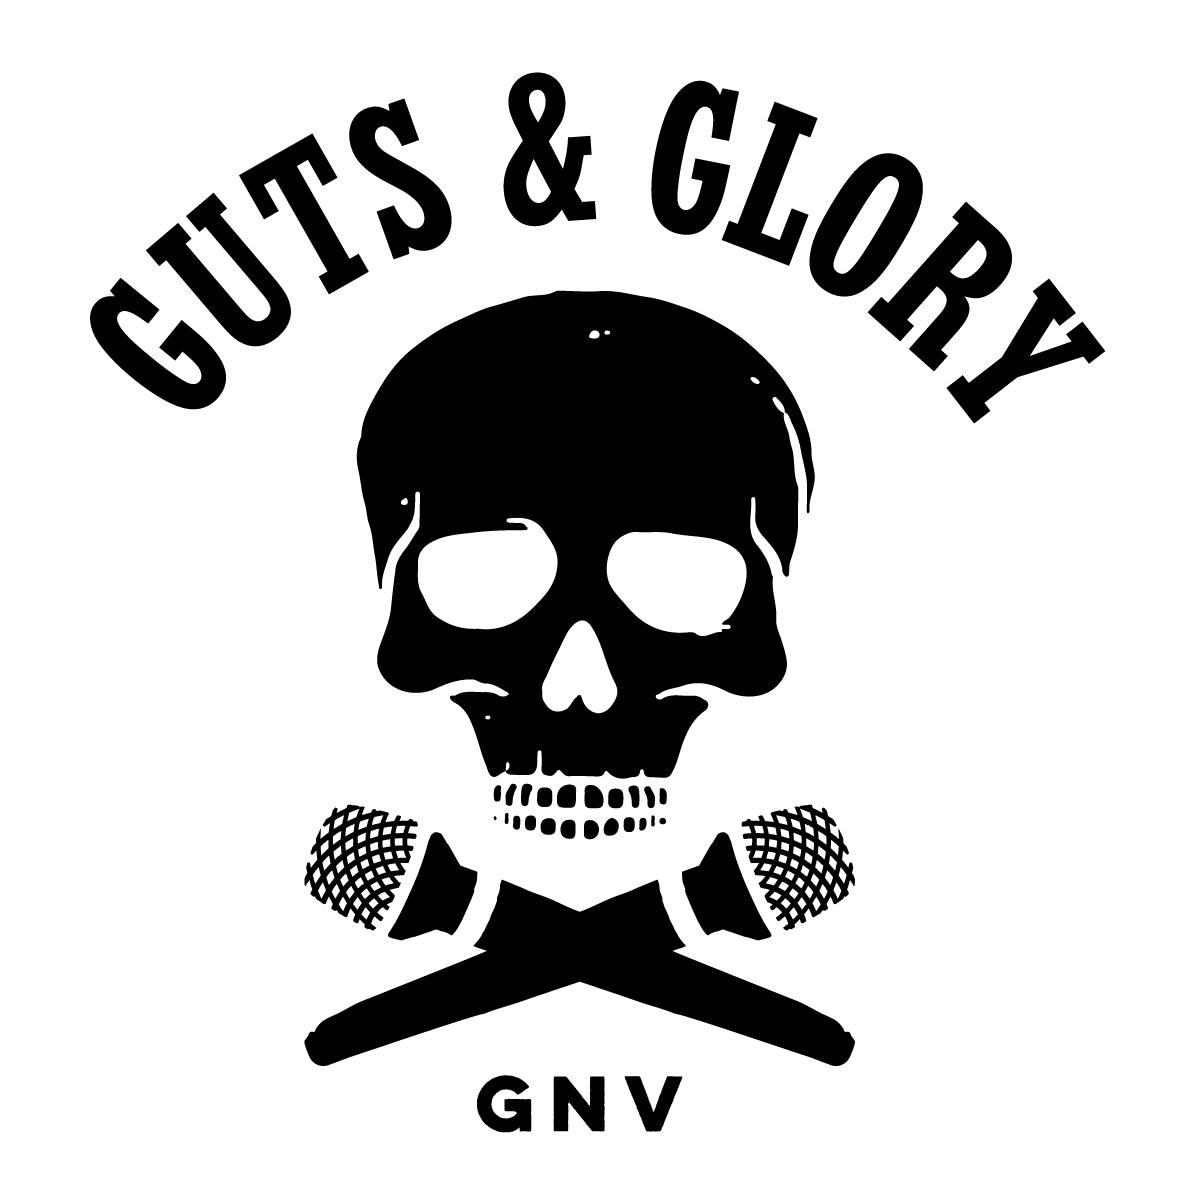 Guts & Glory GNV